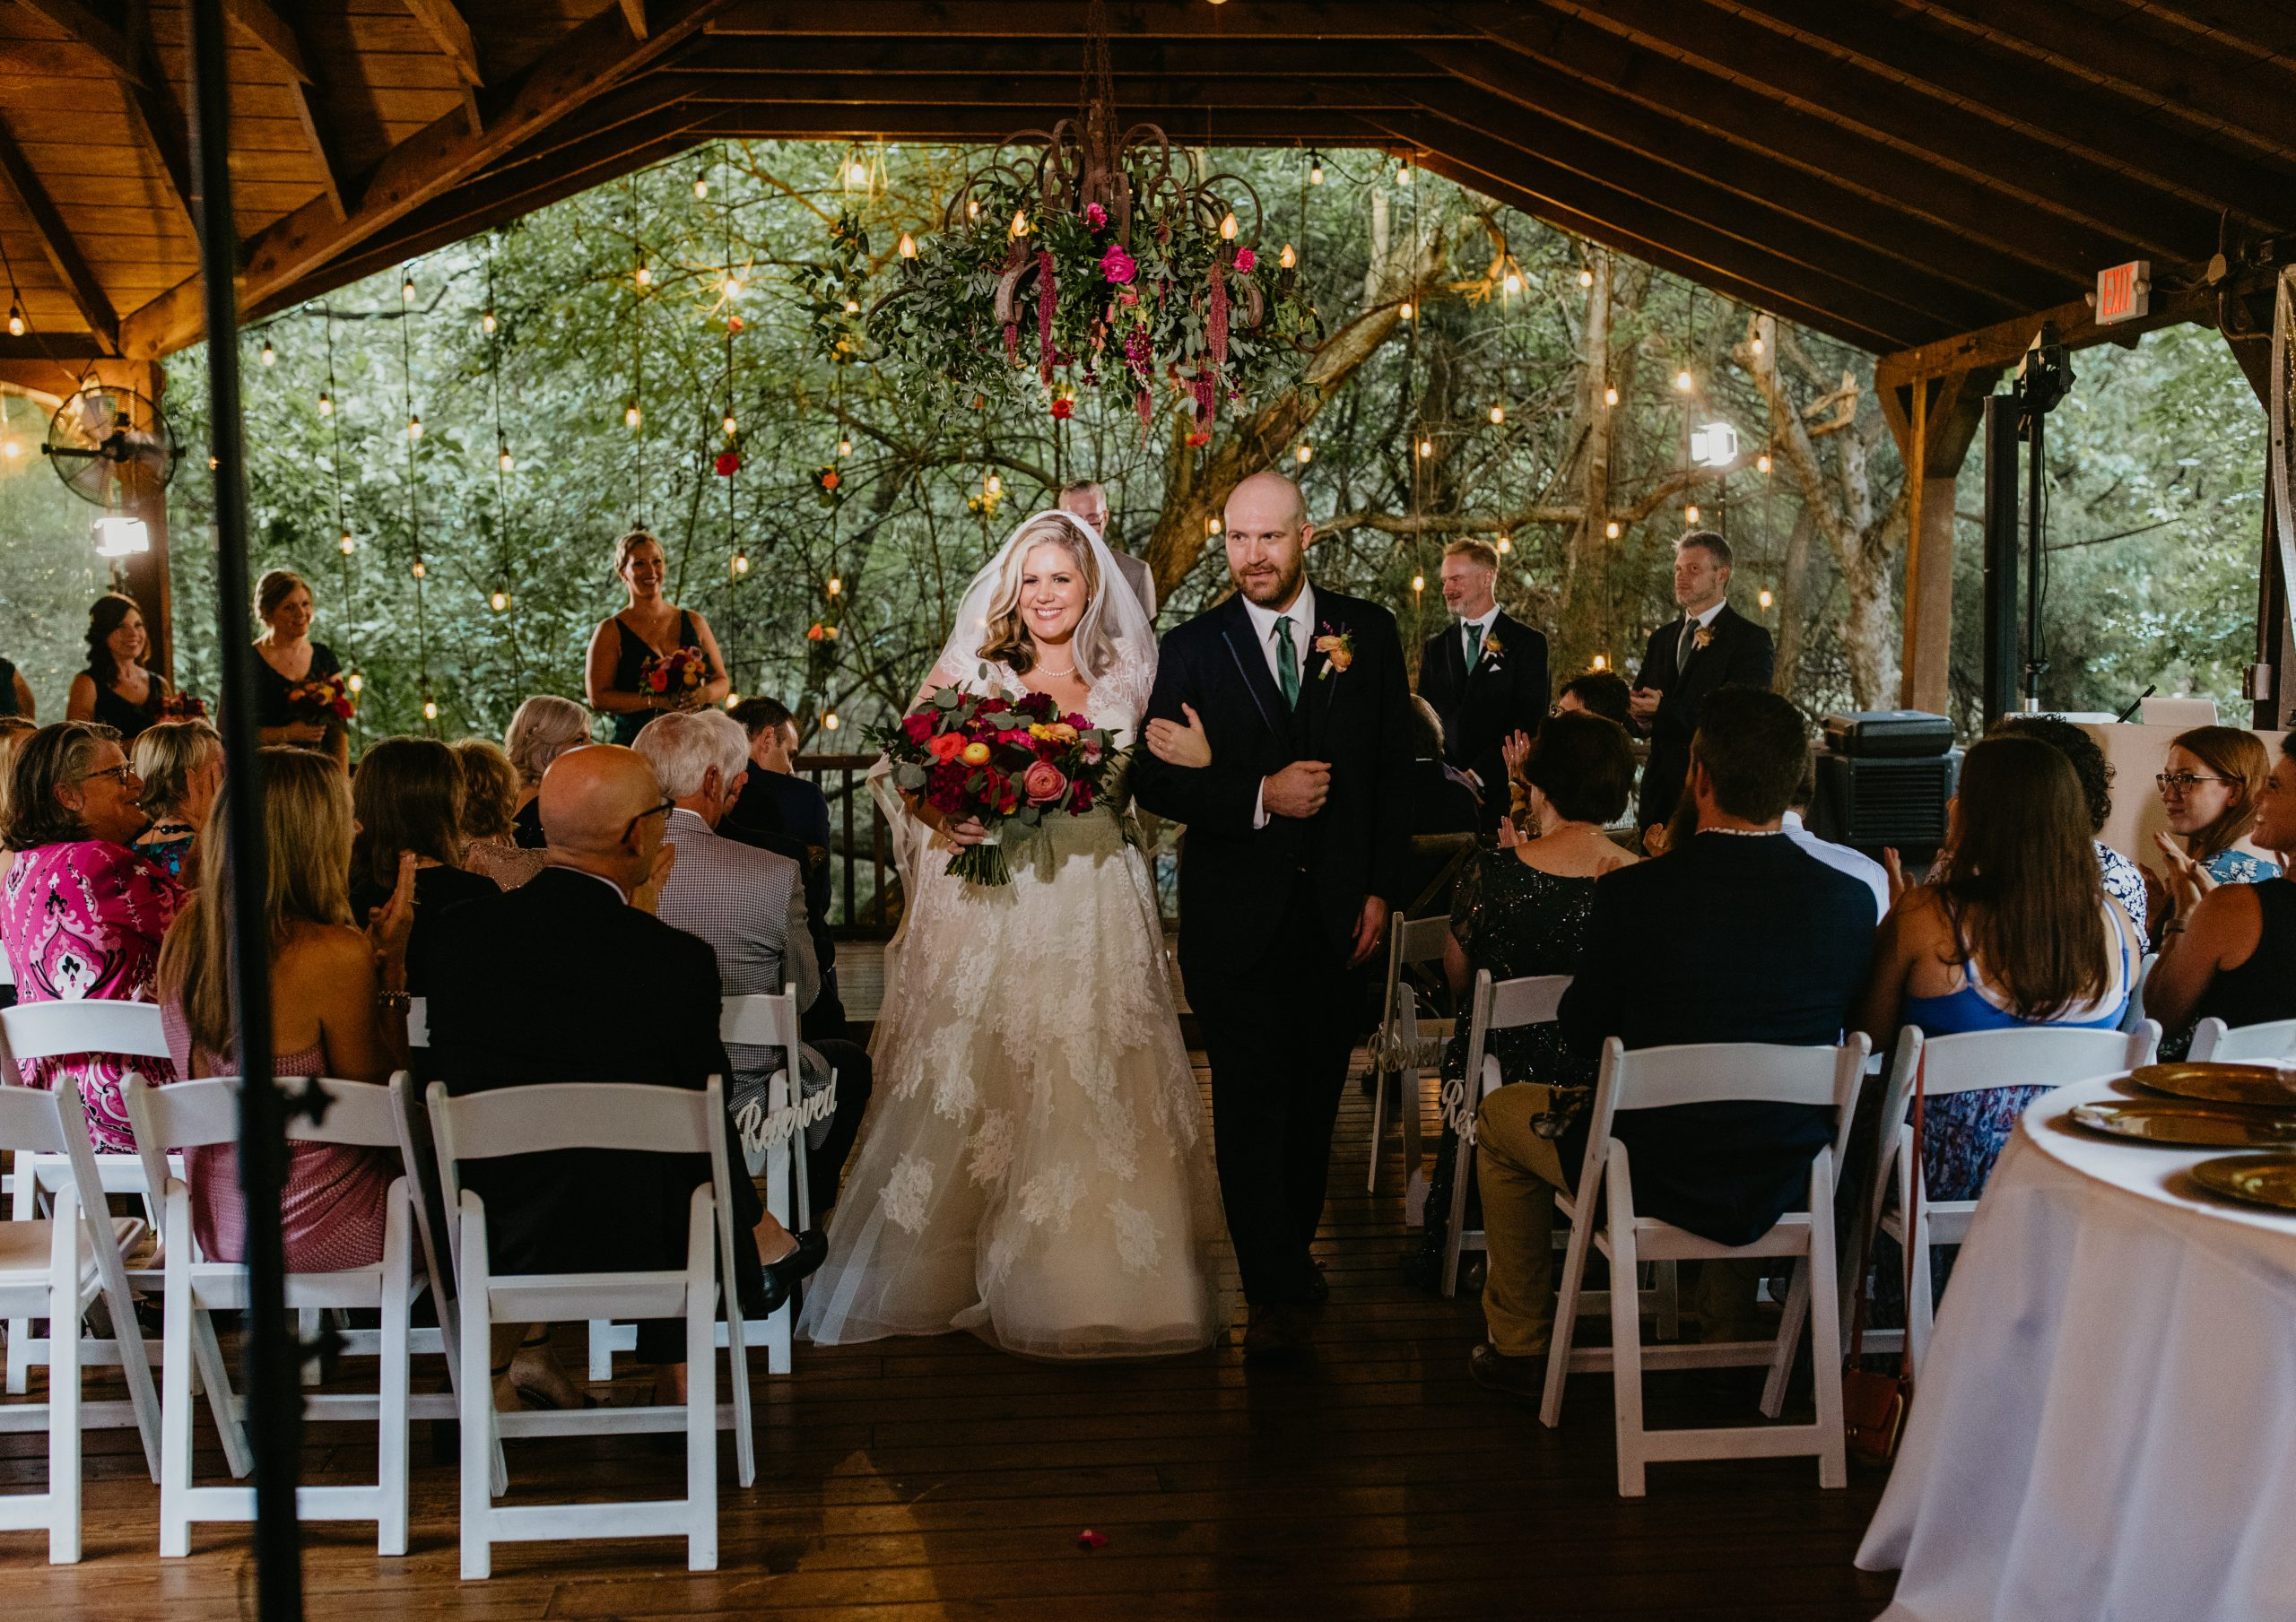 Meme Urbane Photography - Outdoor Garden Wedding - Bride & Groom - McKinney Texas - Avalon Legacy Ranch - Outdoor Wedding - Wedding Ceremony - Bright Color Outdoor Wedding